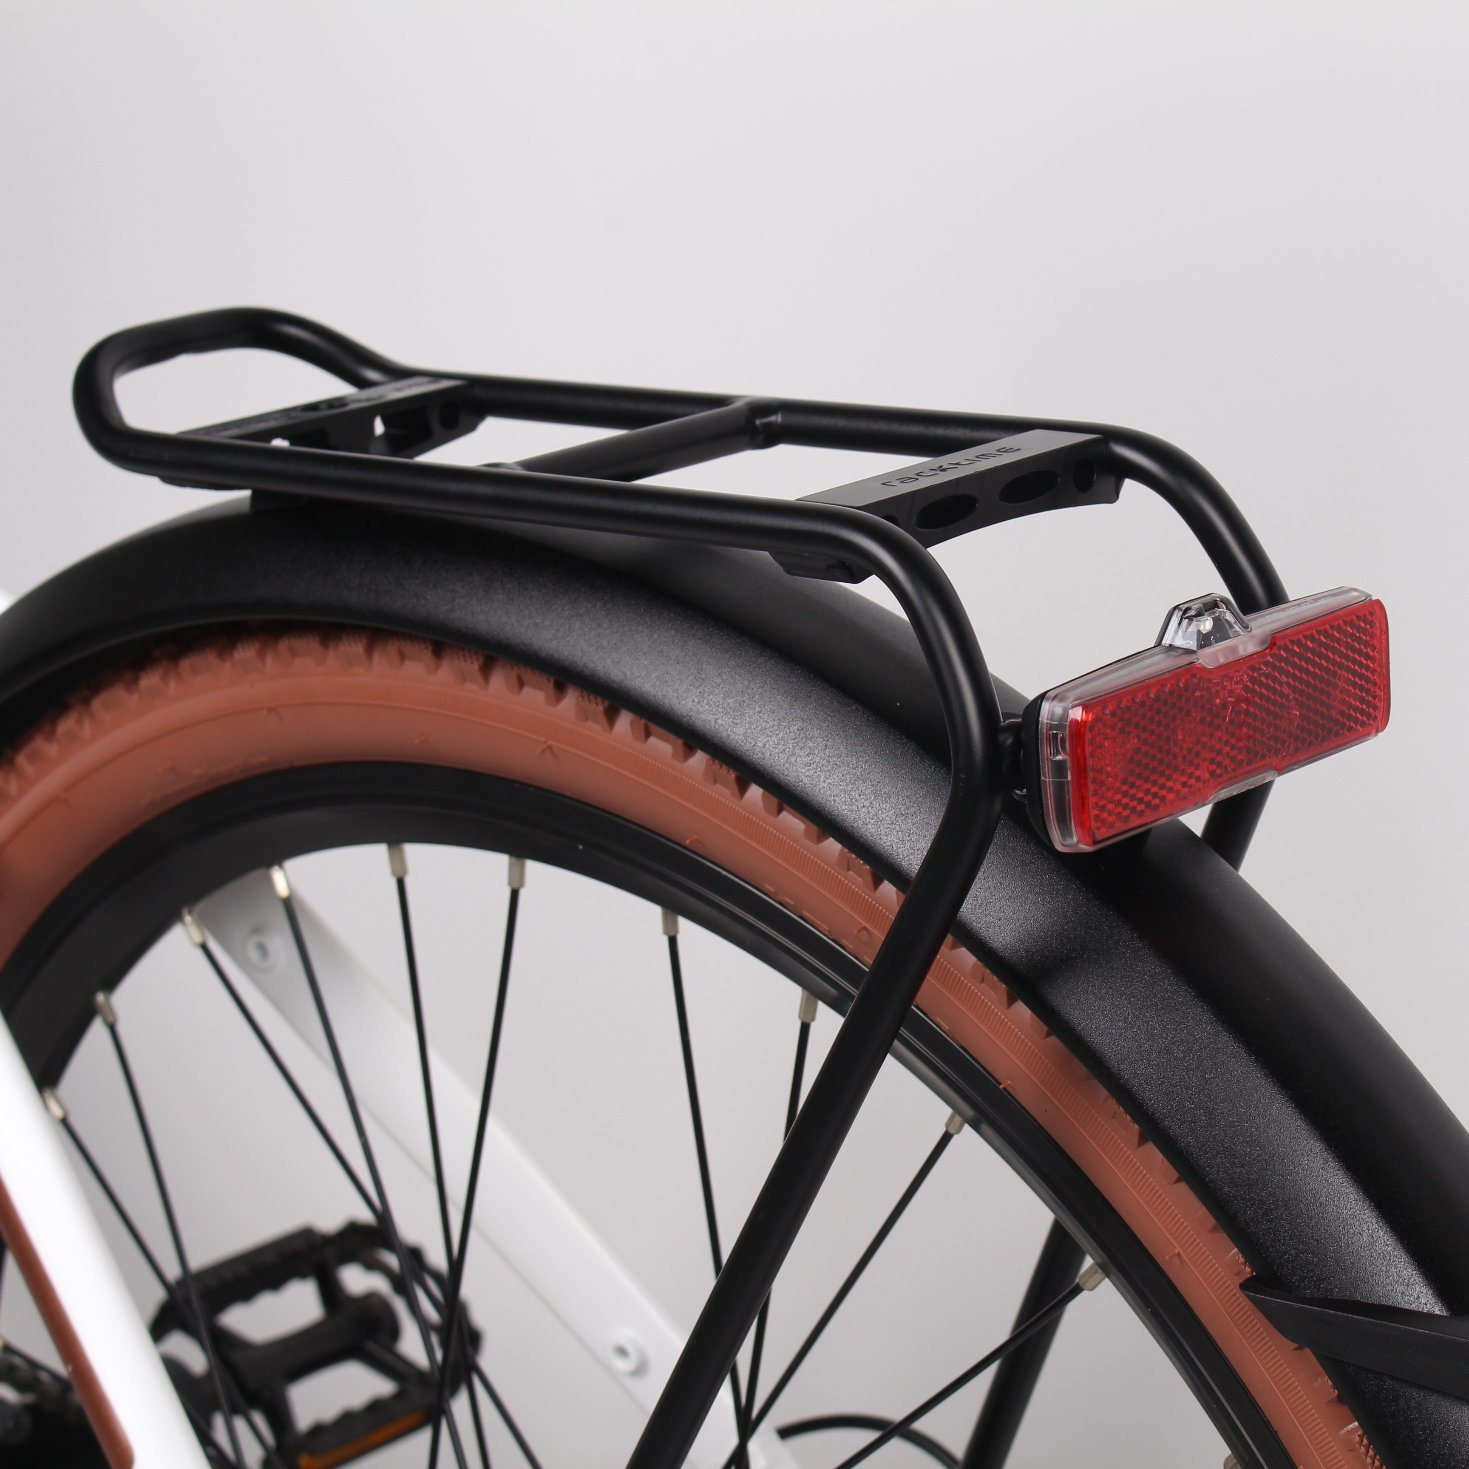 2017 New Lady Bike Hidden Battery 36V 250W Electric Bike